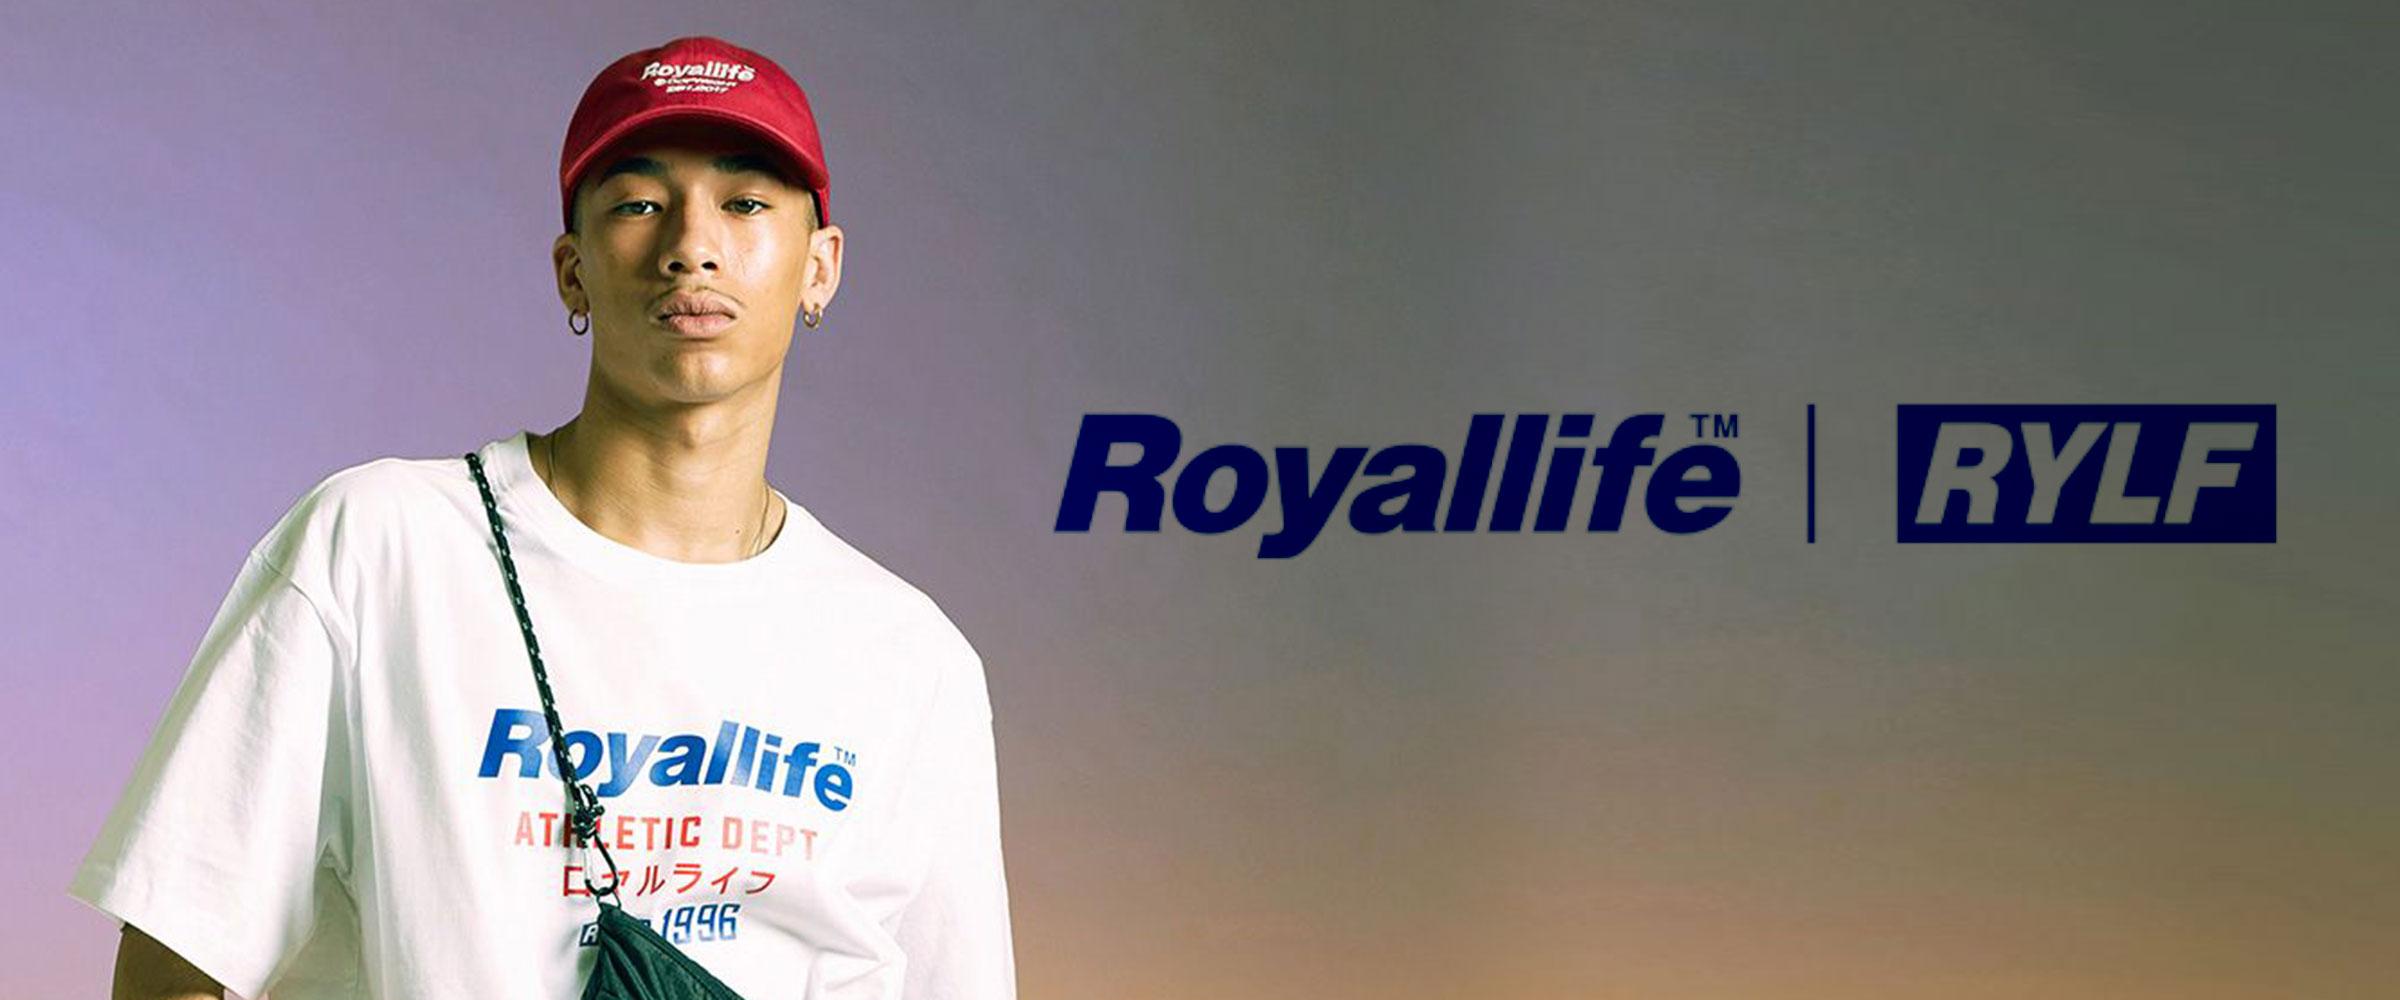 royallife_01.jpg